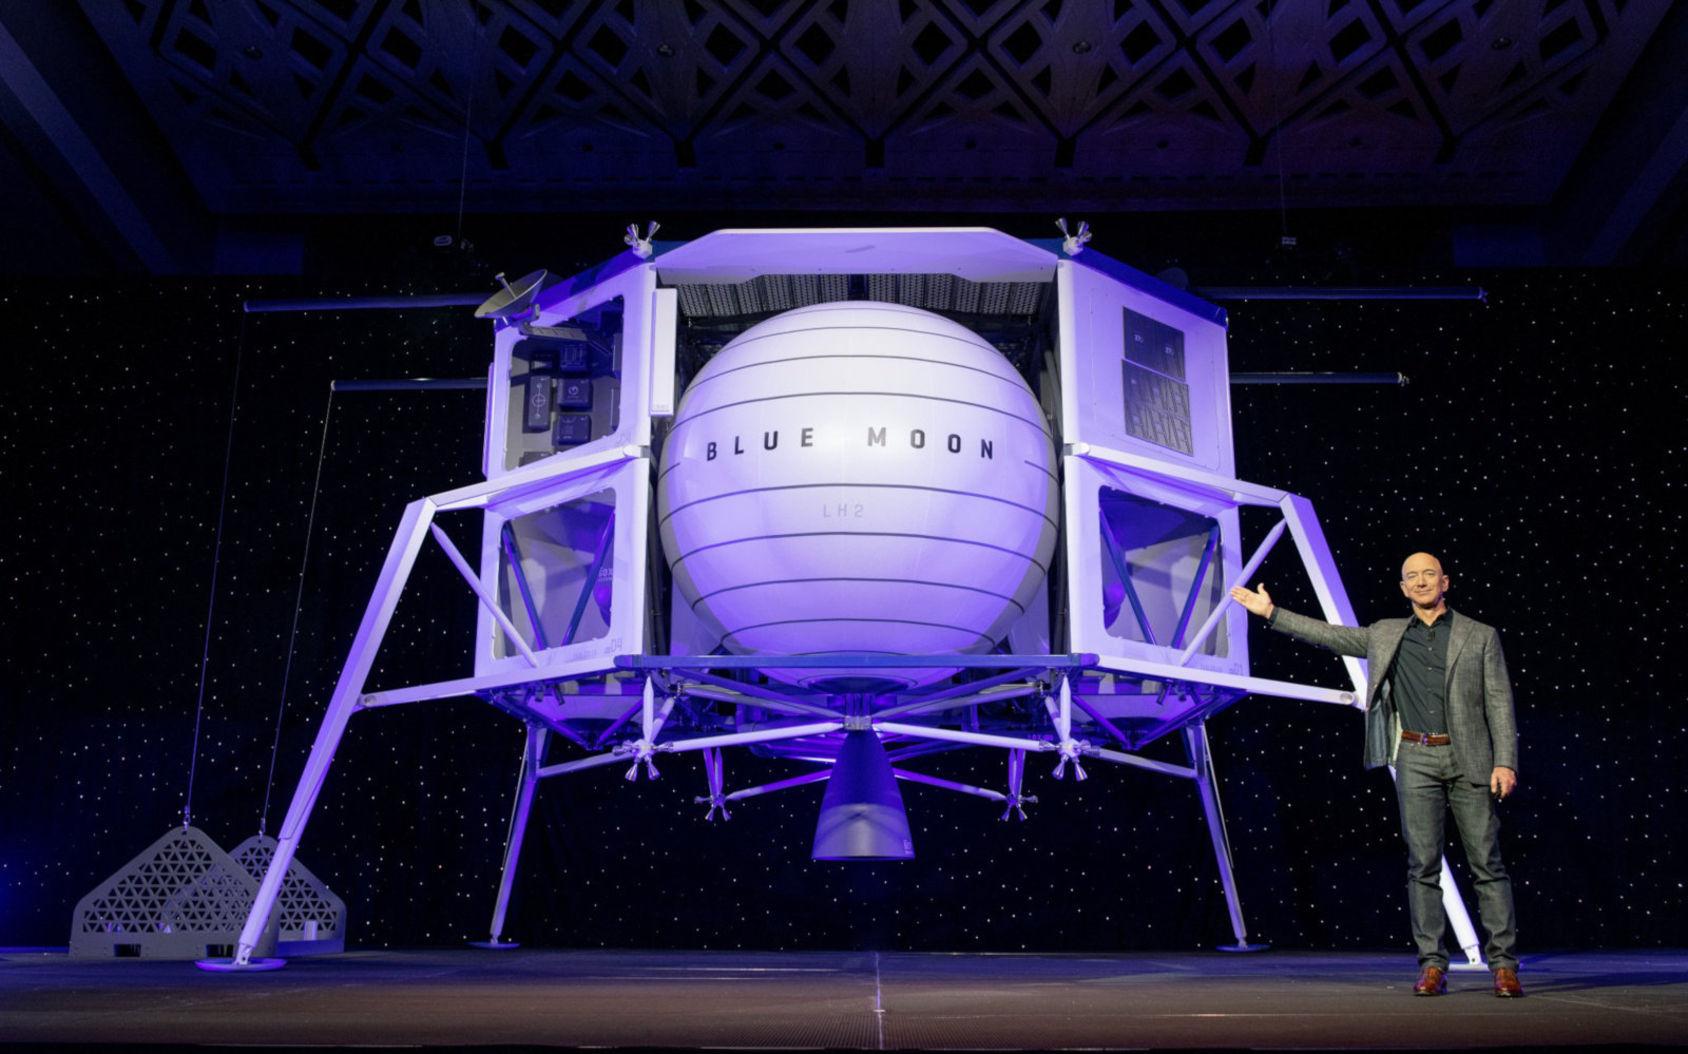 Jeff Bezos siktar mot månen